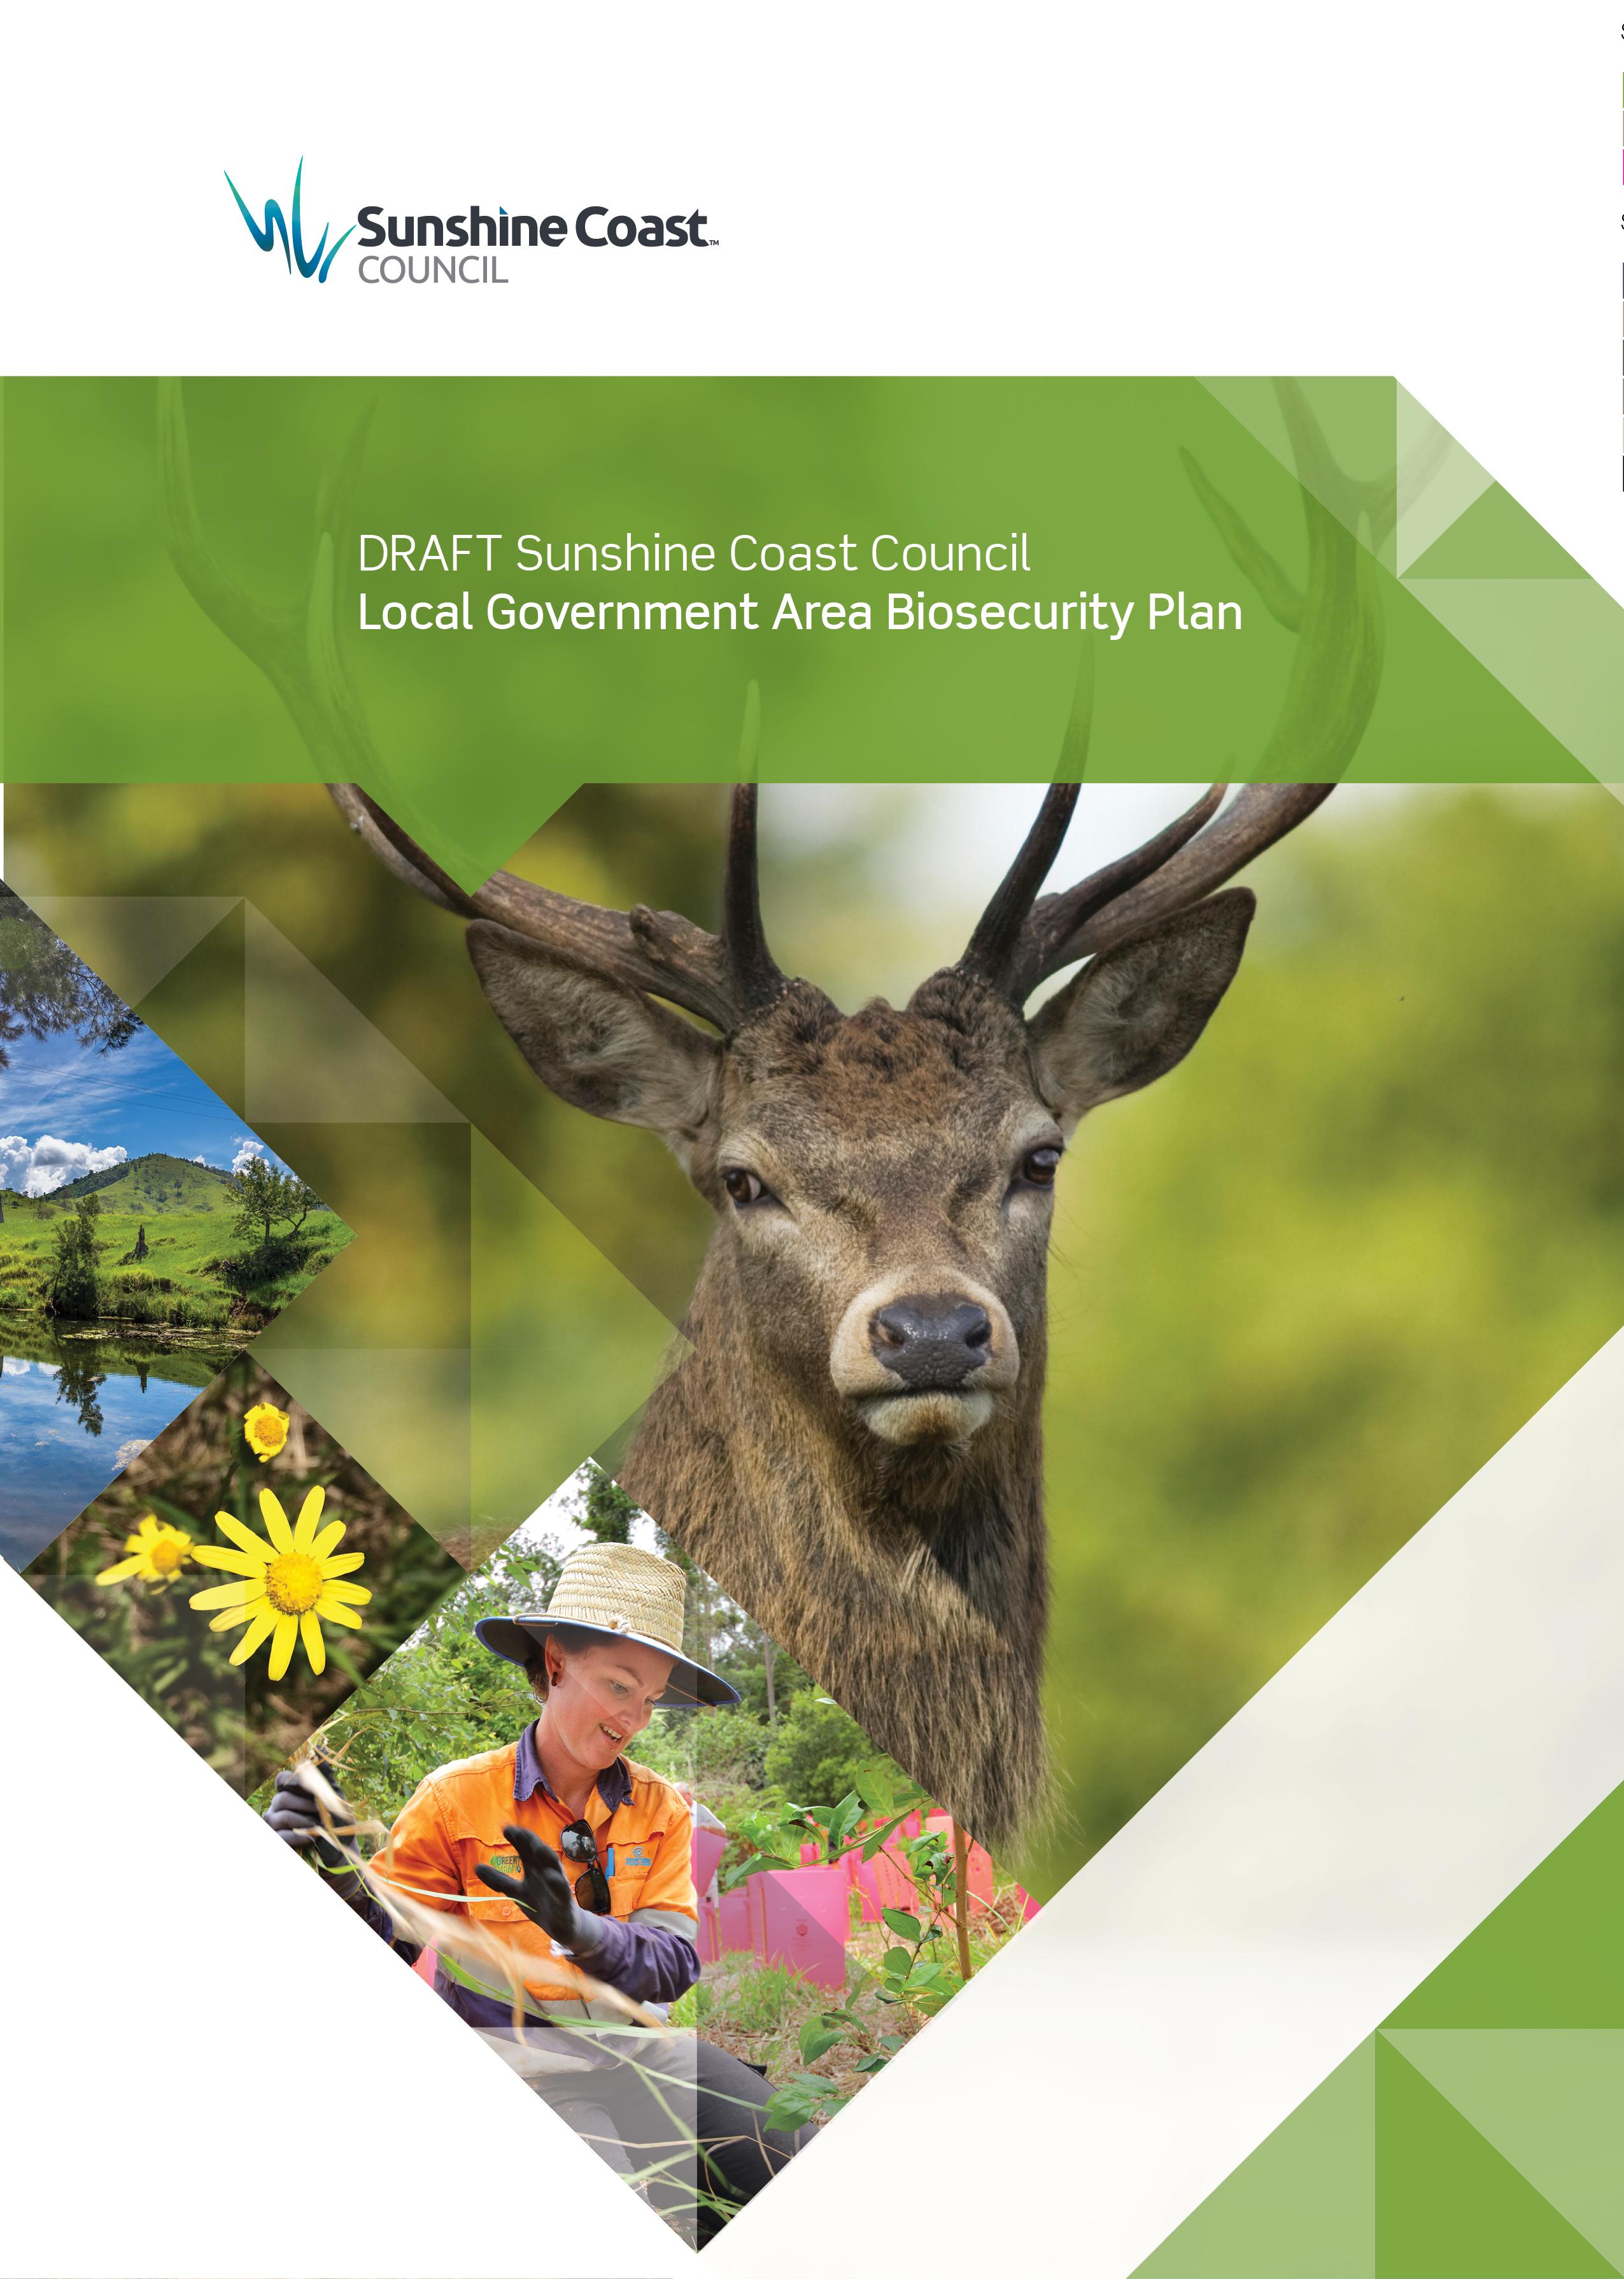 Draft Sunshine Coast Local Government Area Biosecurity Plan